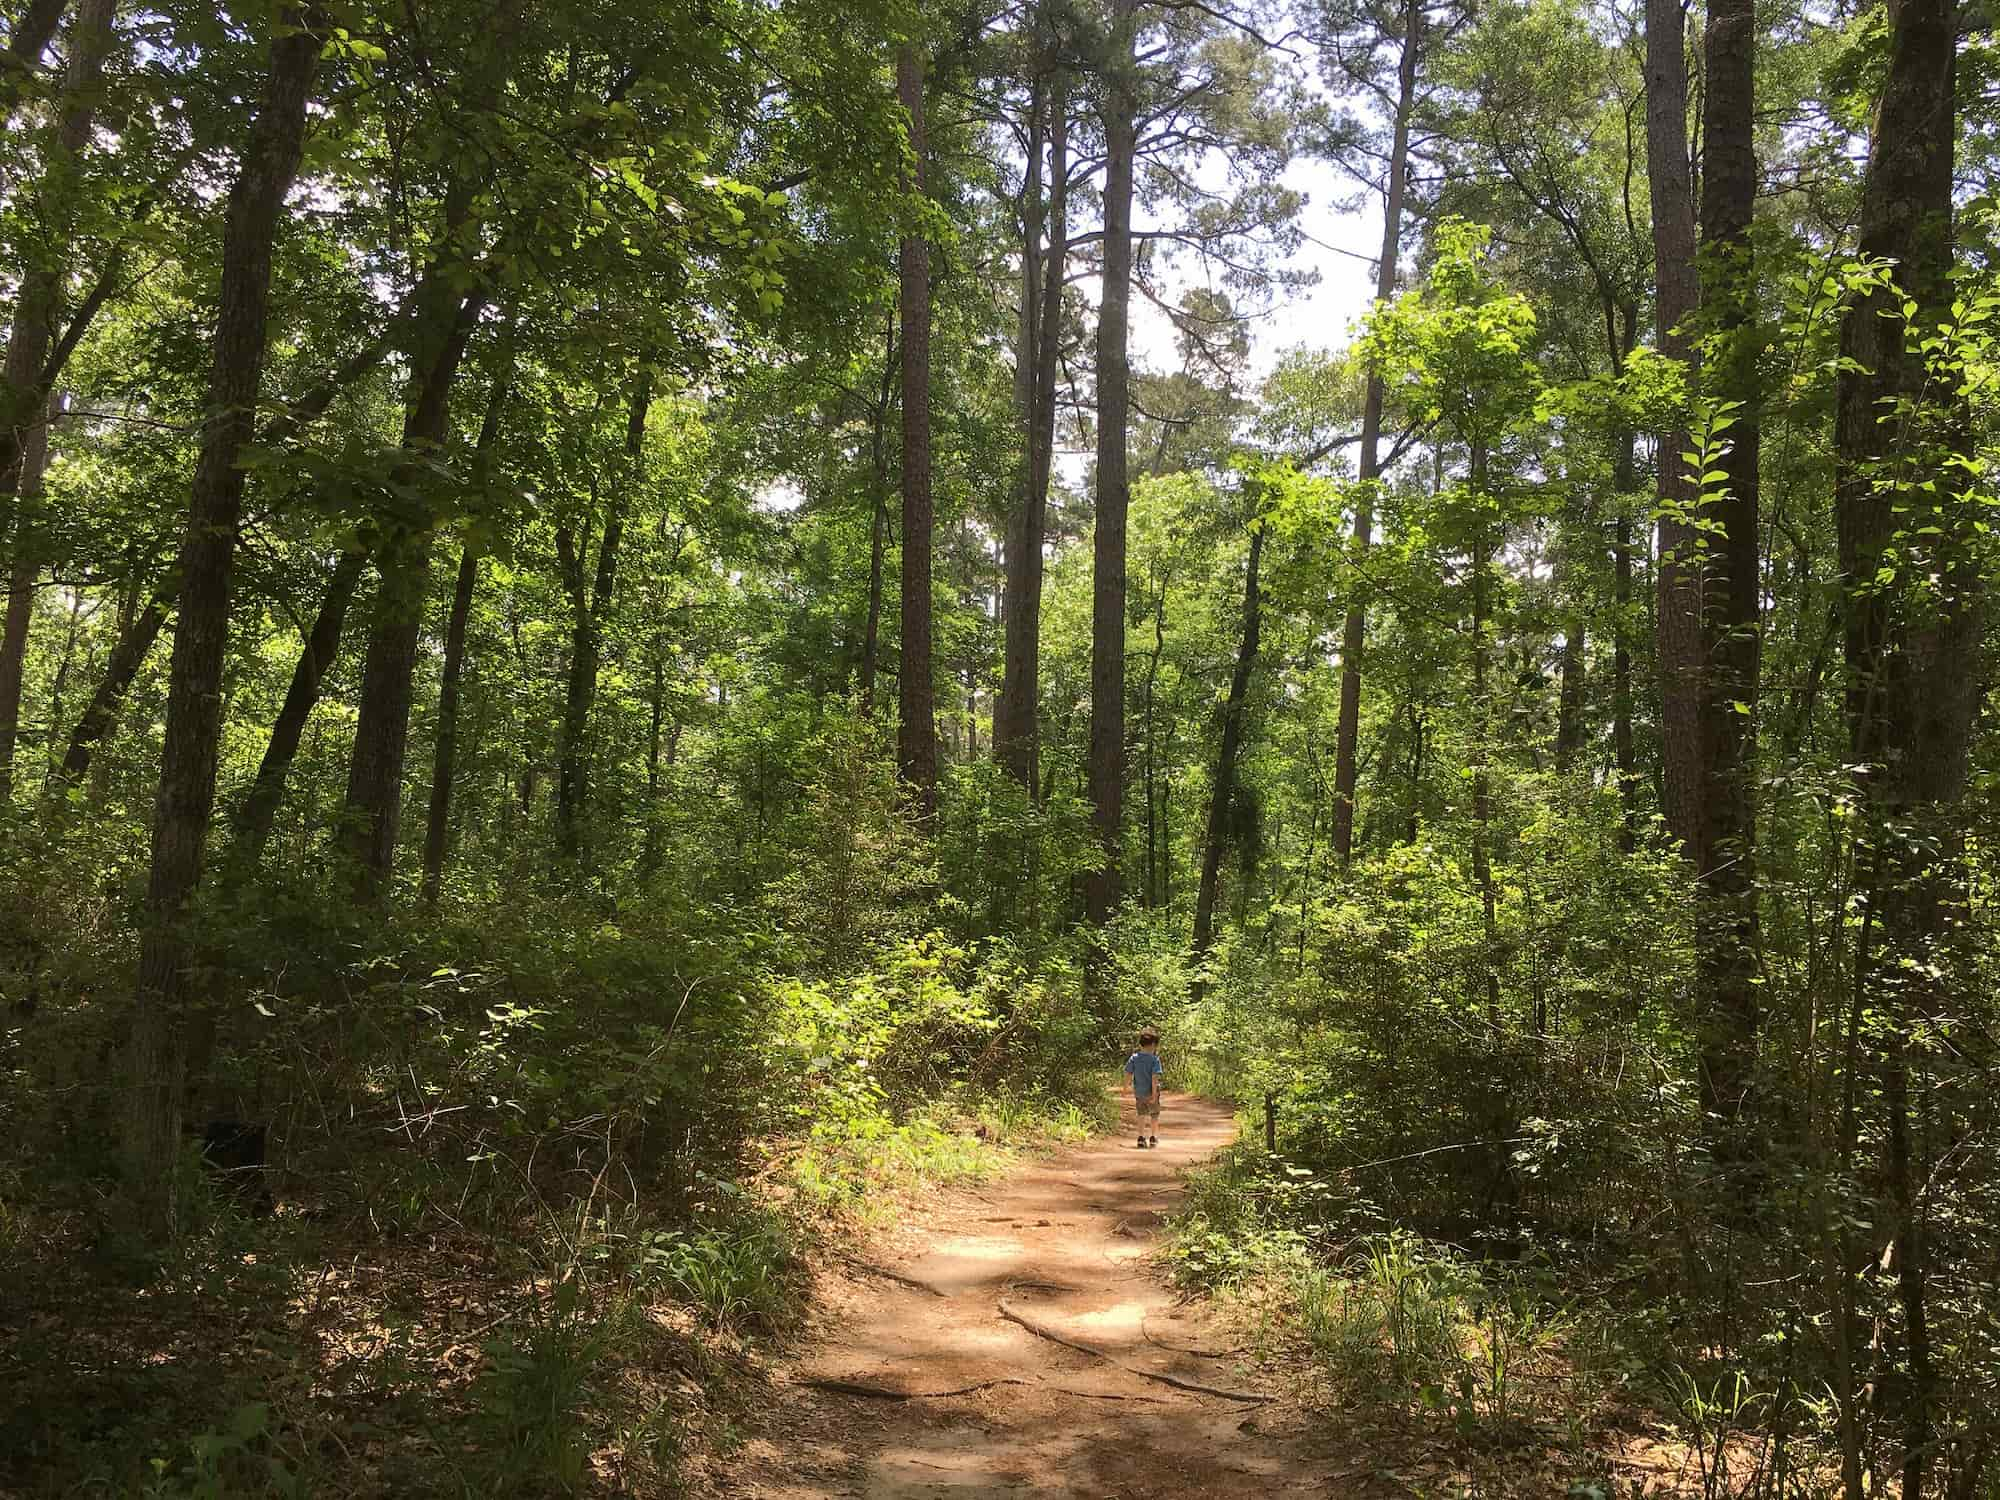 Little boy walks on forested hiking trail in dappled sunshine.